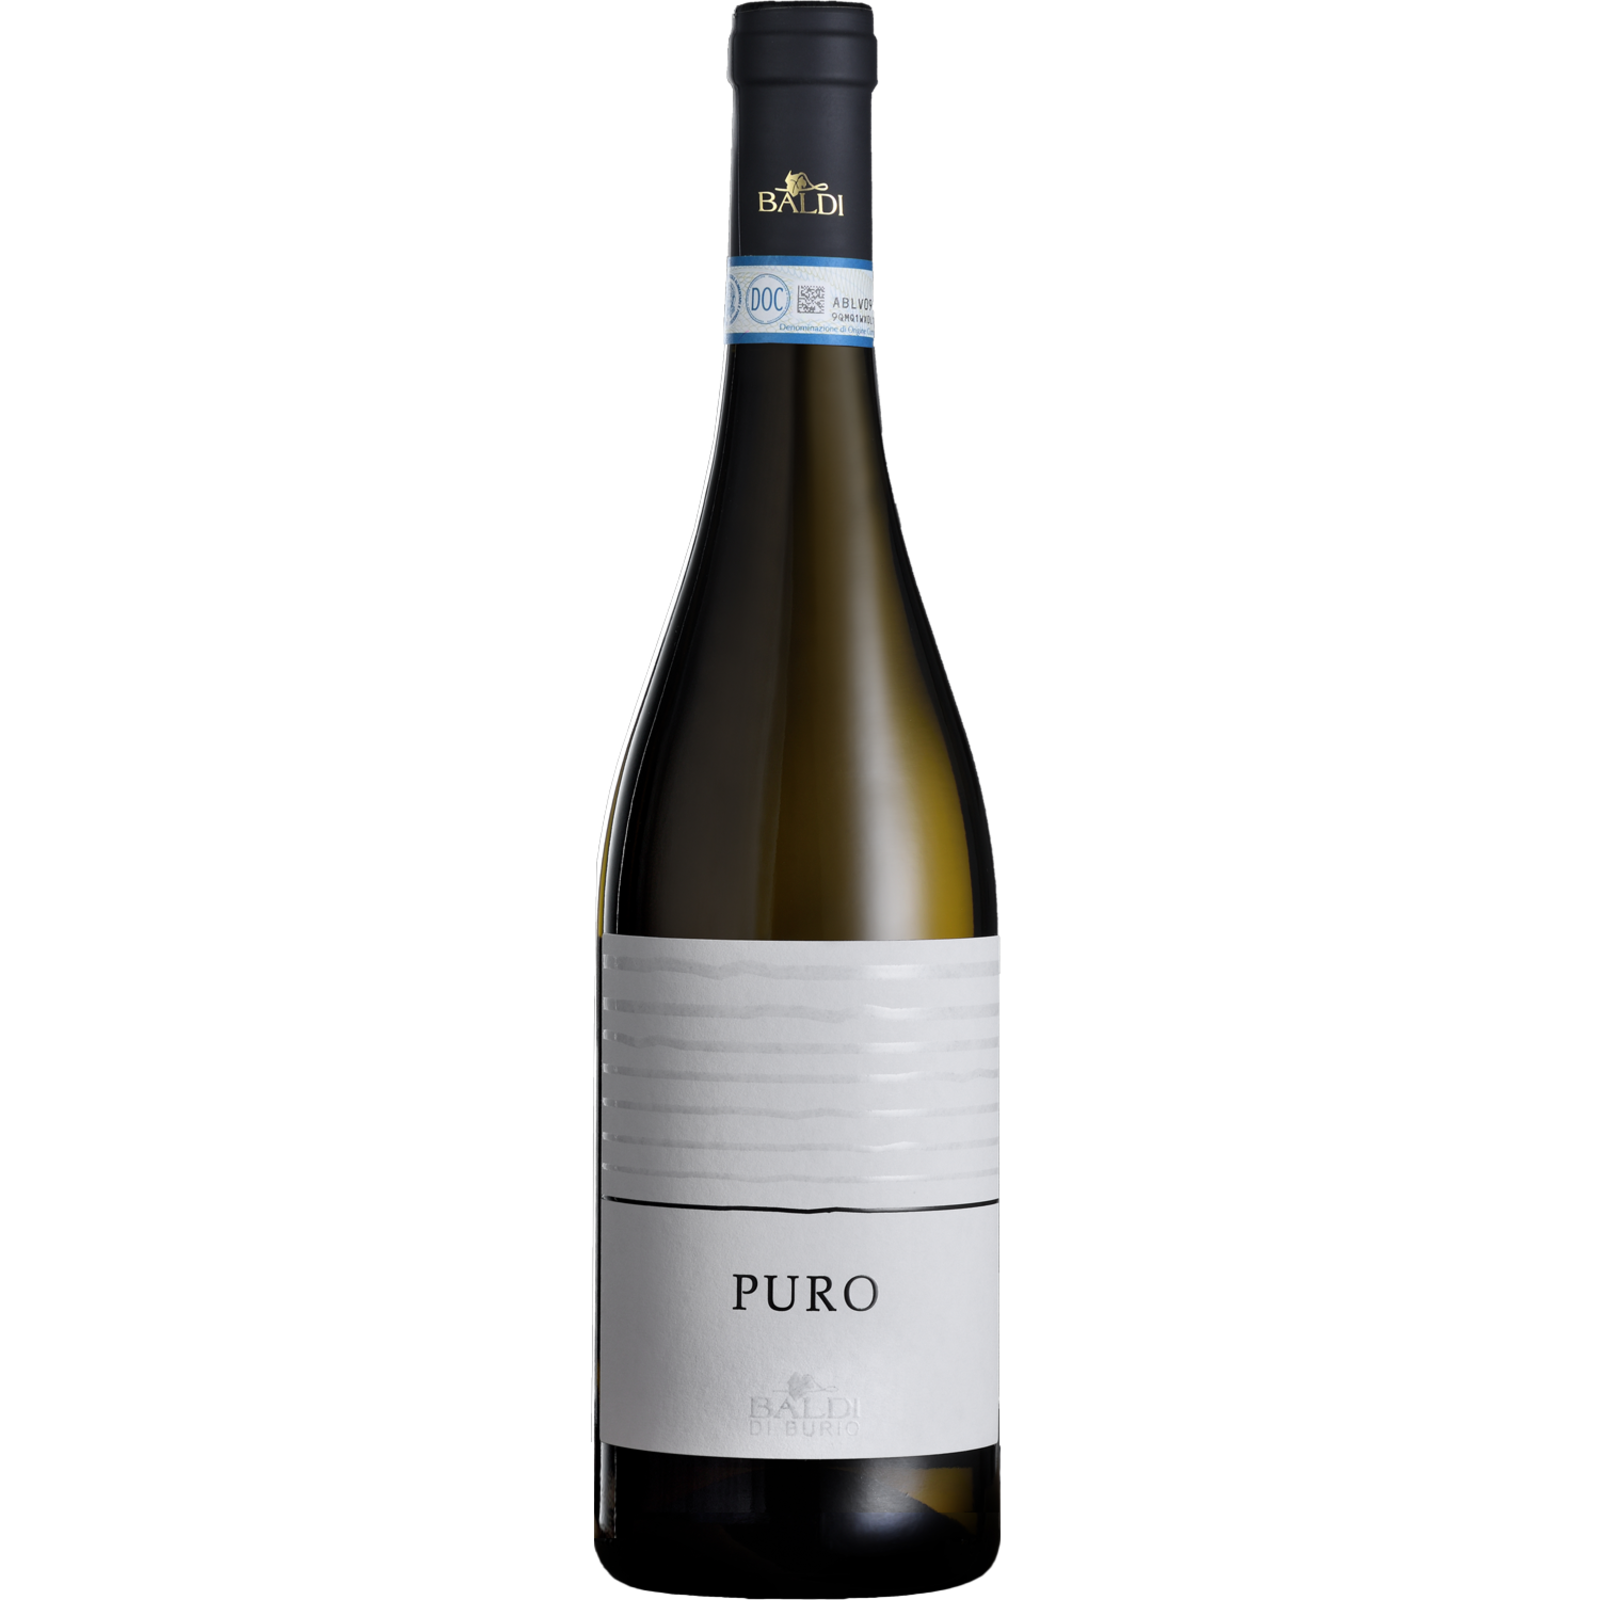 Baldi di Burio Baldi di Burio Chardonnay Puro 2018